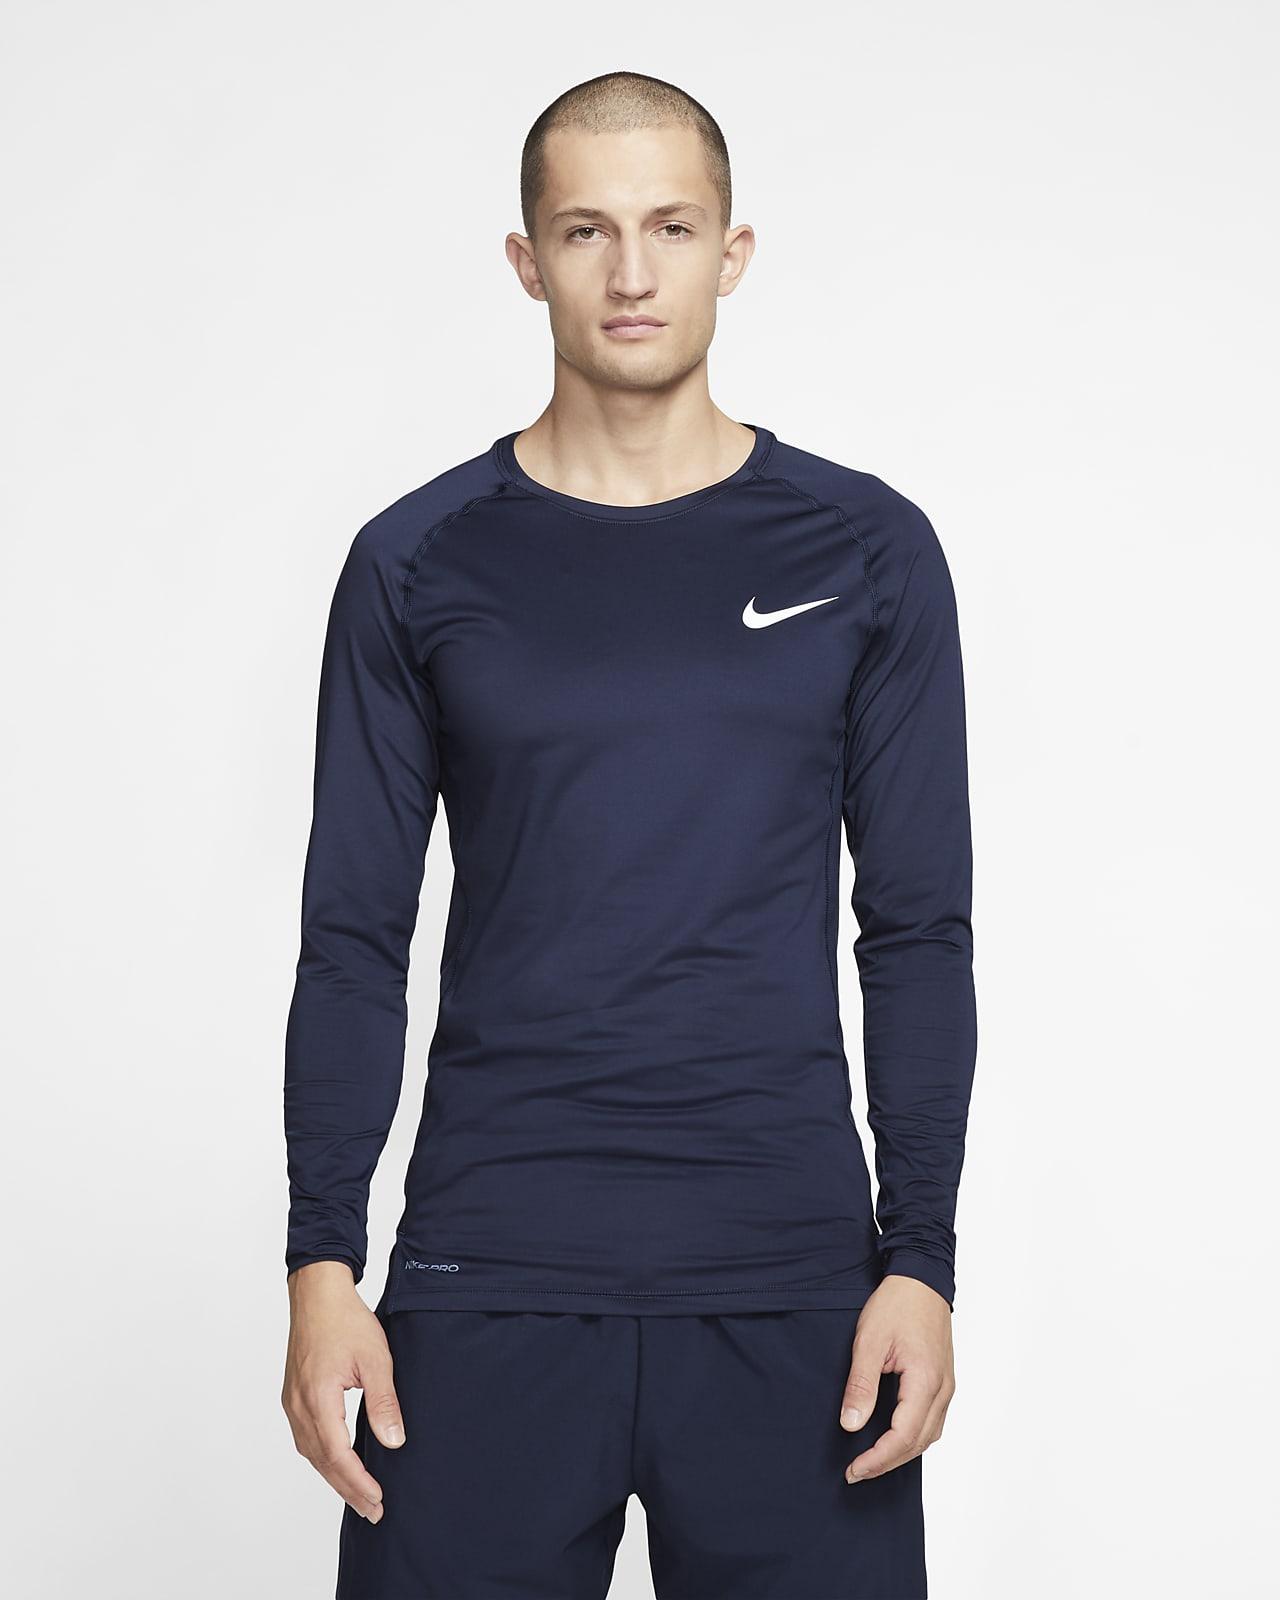 Tight-Fit Long-Sleeve Top. Nike LU